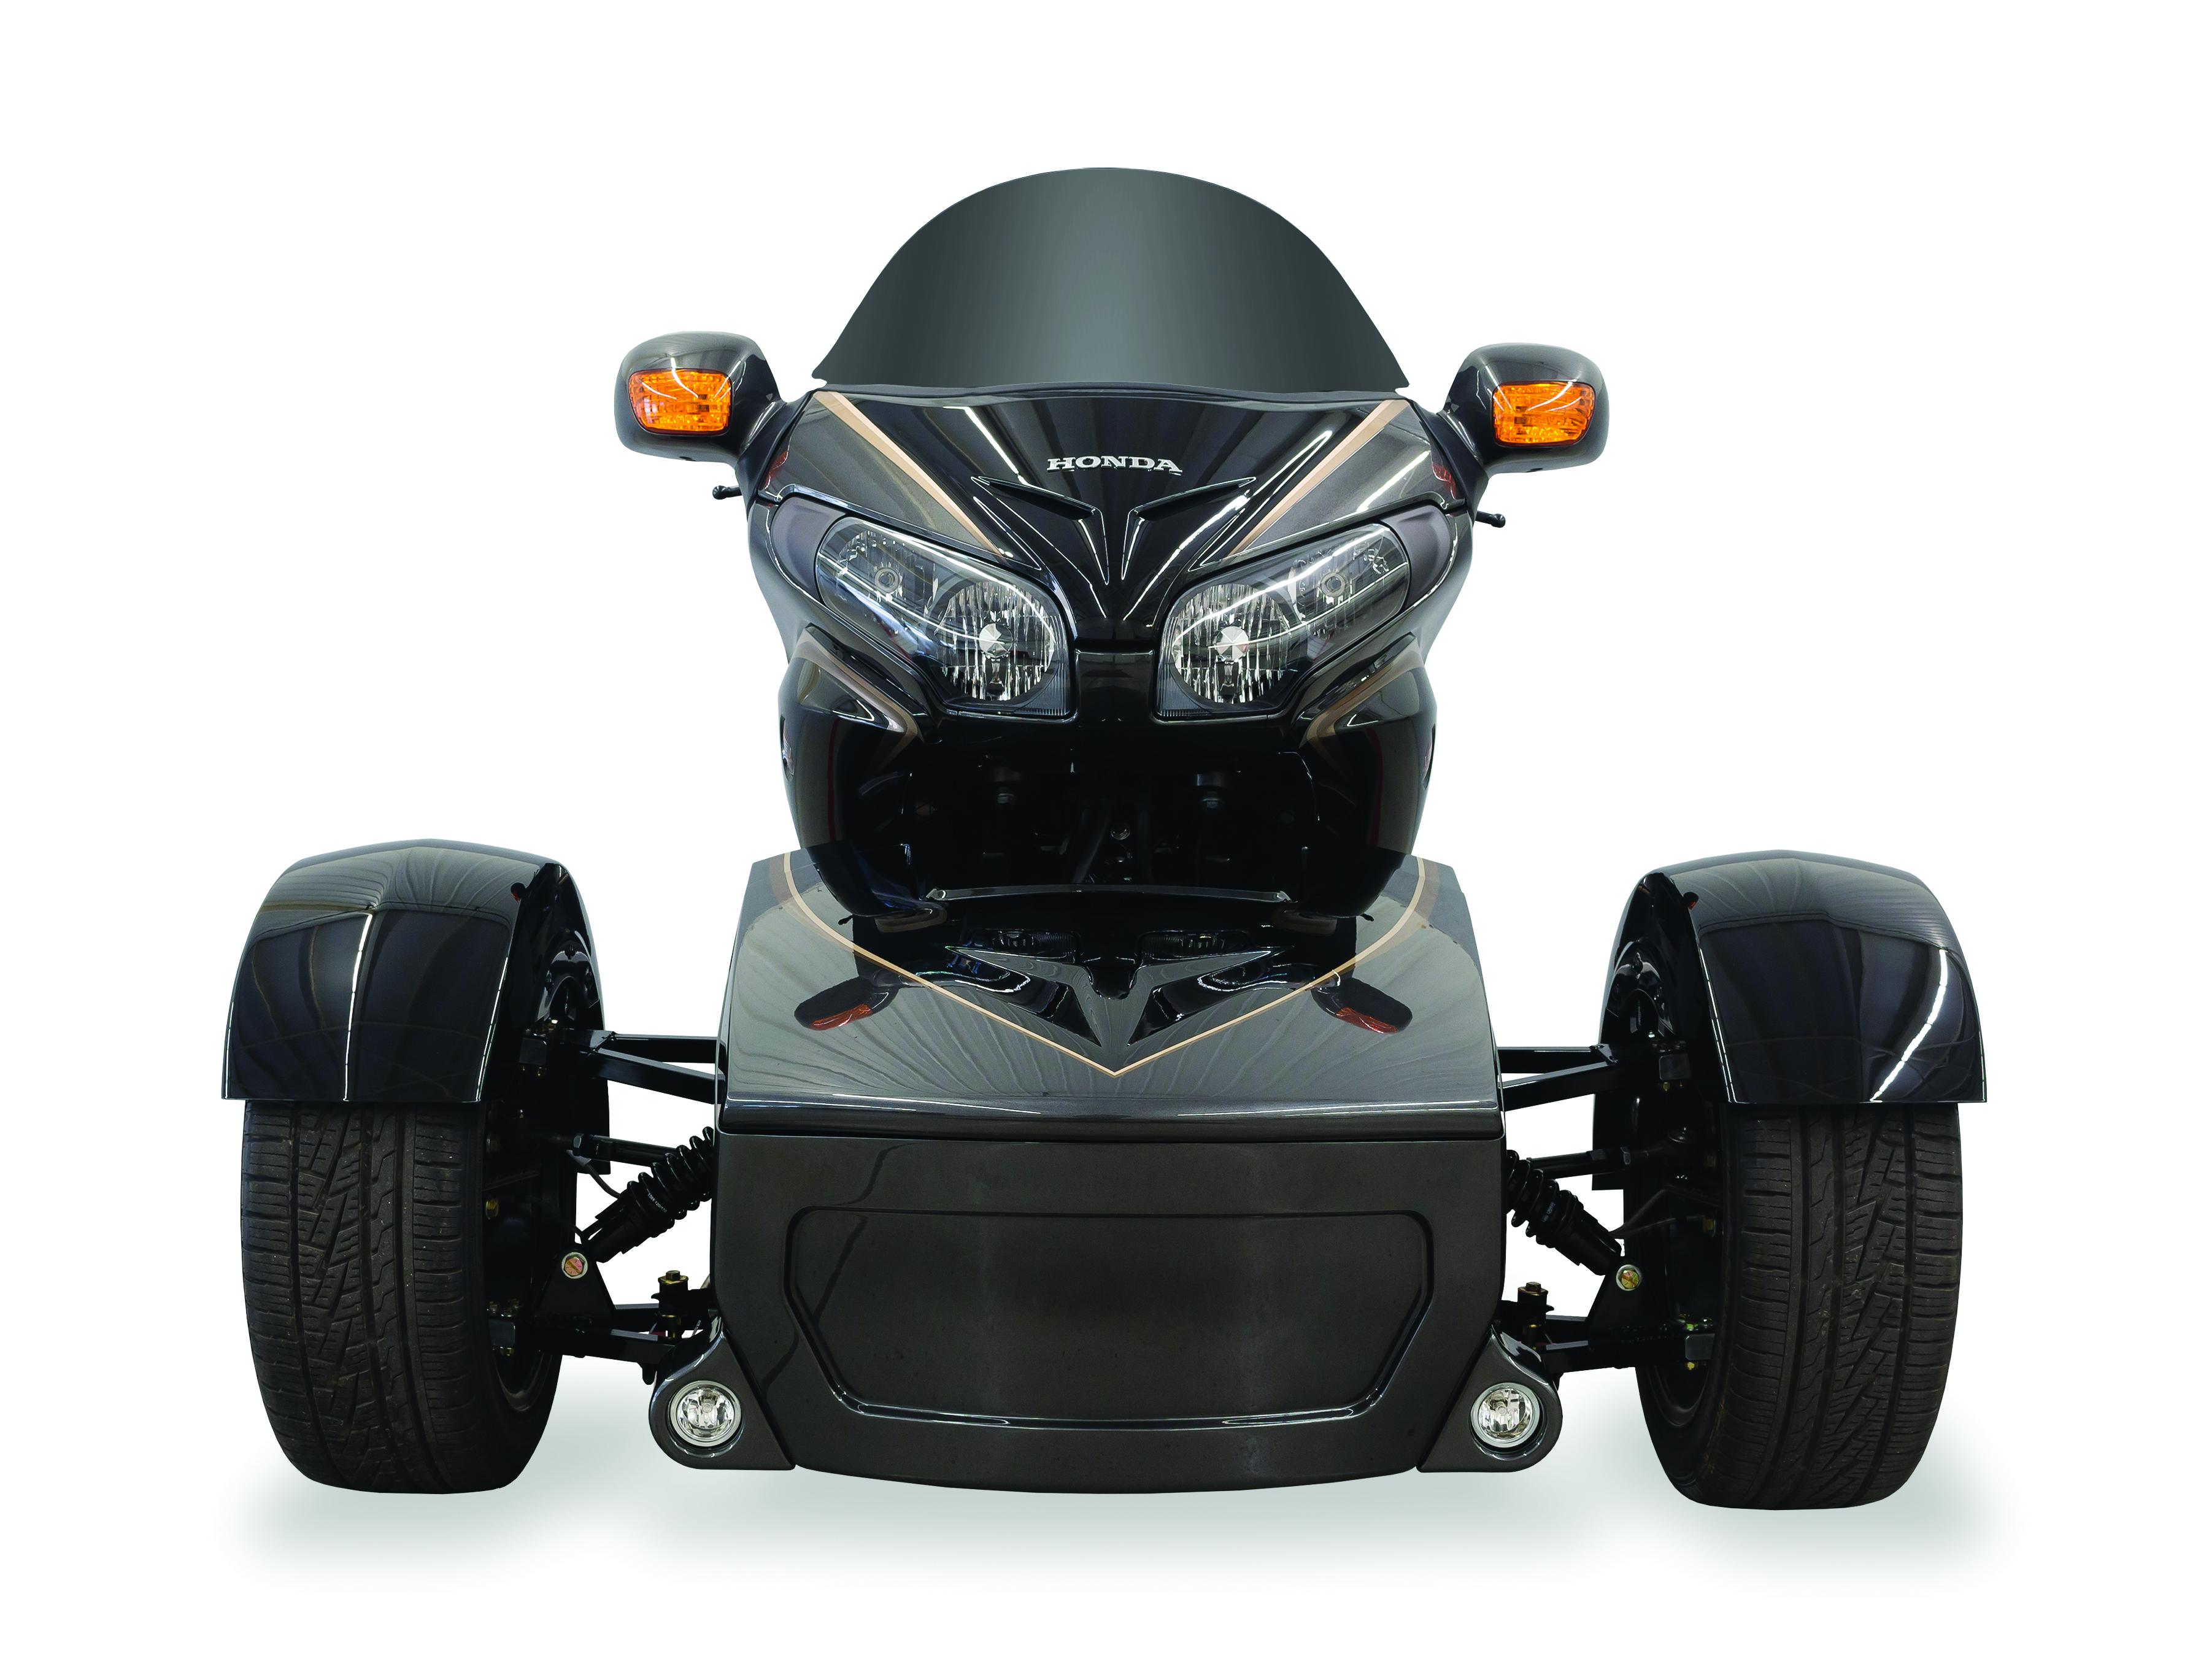 Wiring Diagram Honda Trikes Electrical Diagrams 2000 Gl1500 Goldwing Trike Rear Fuse Box U2022 Civic